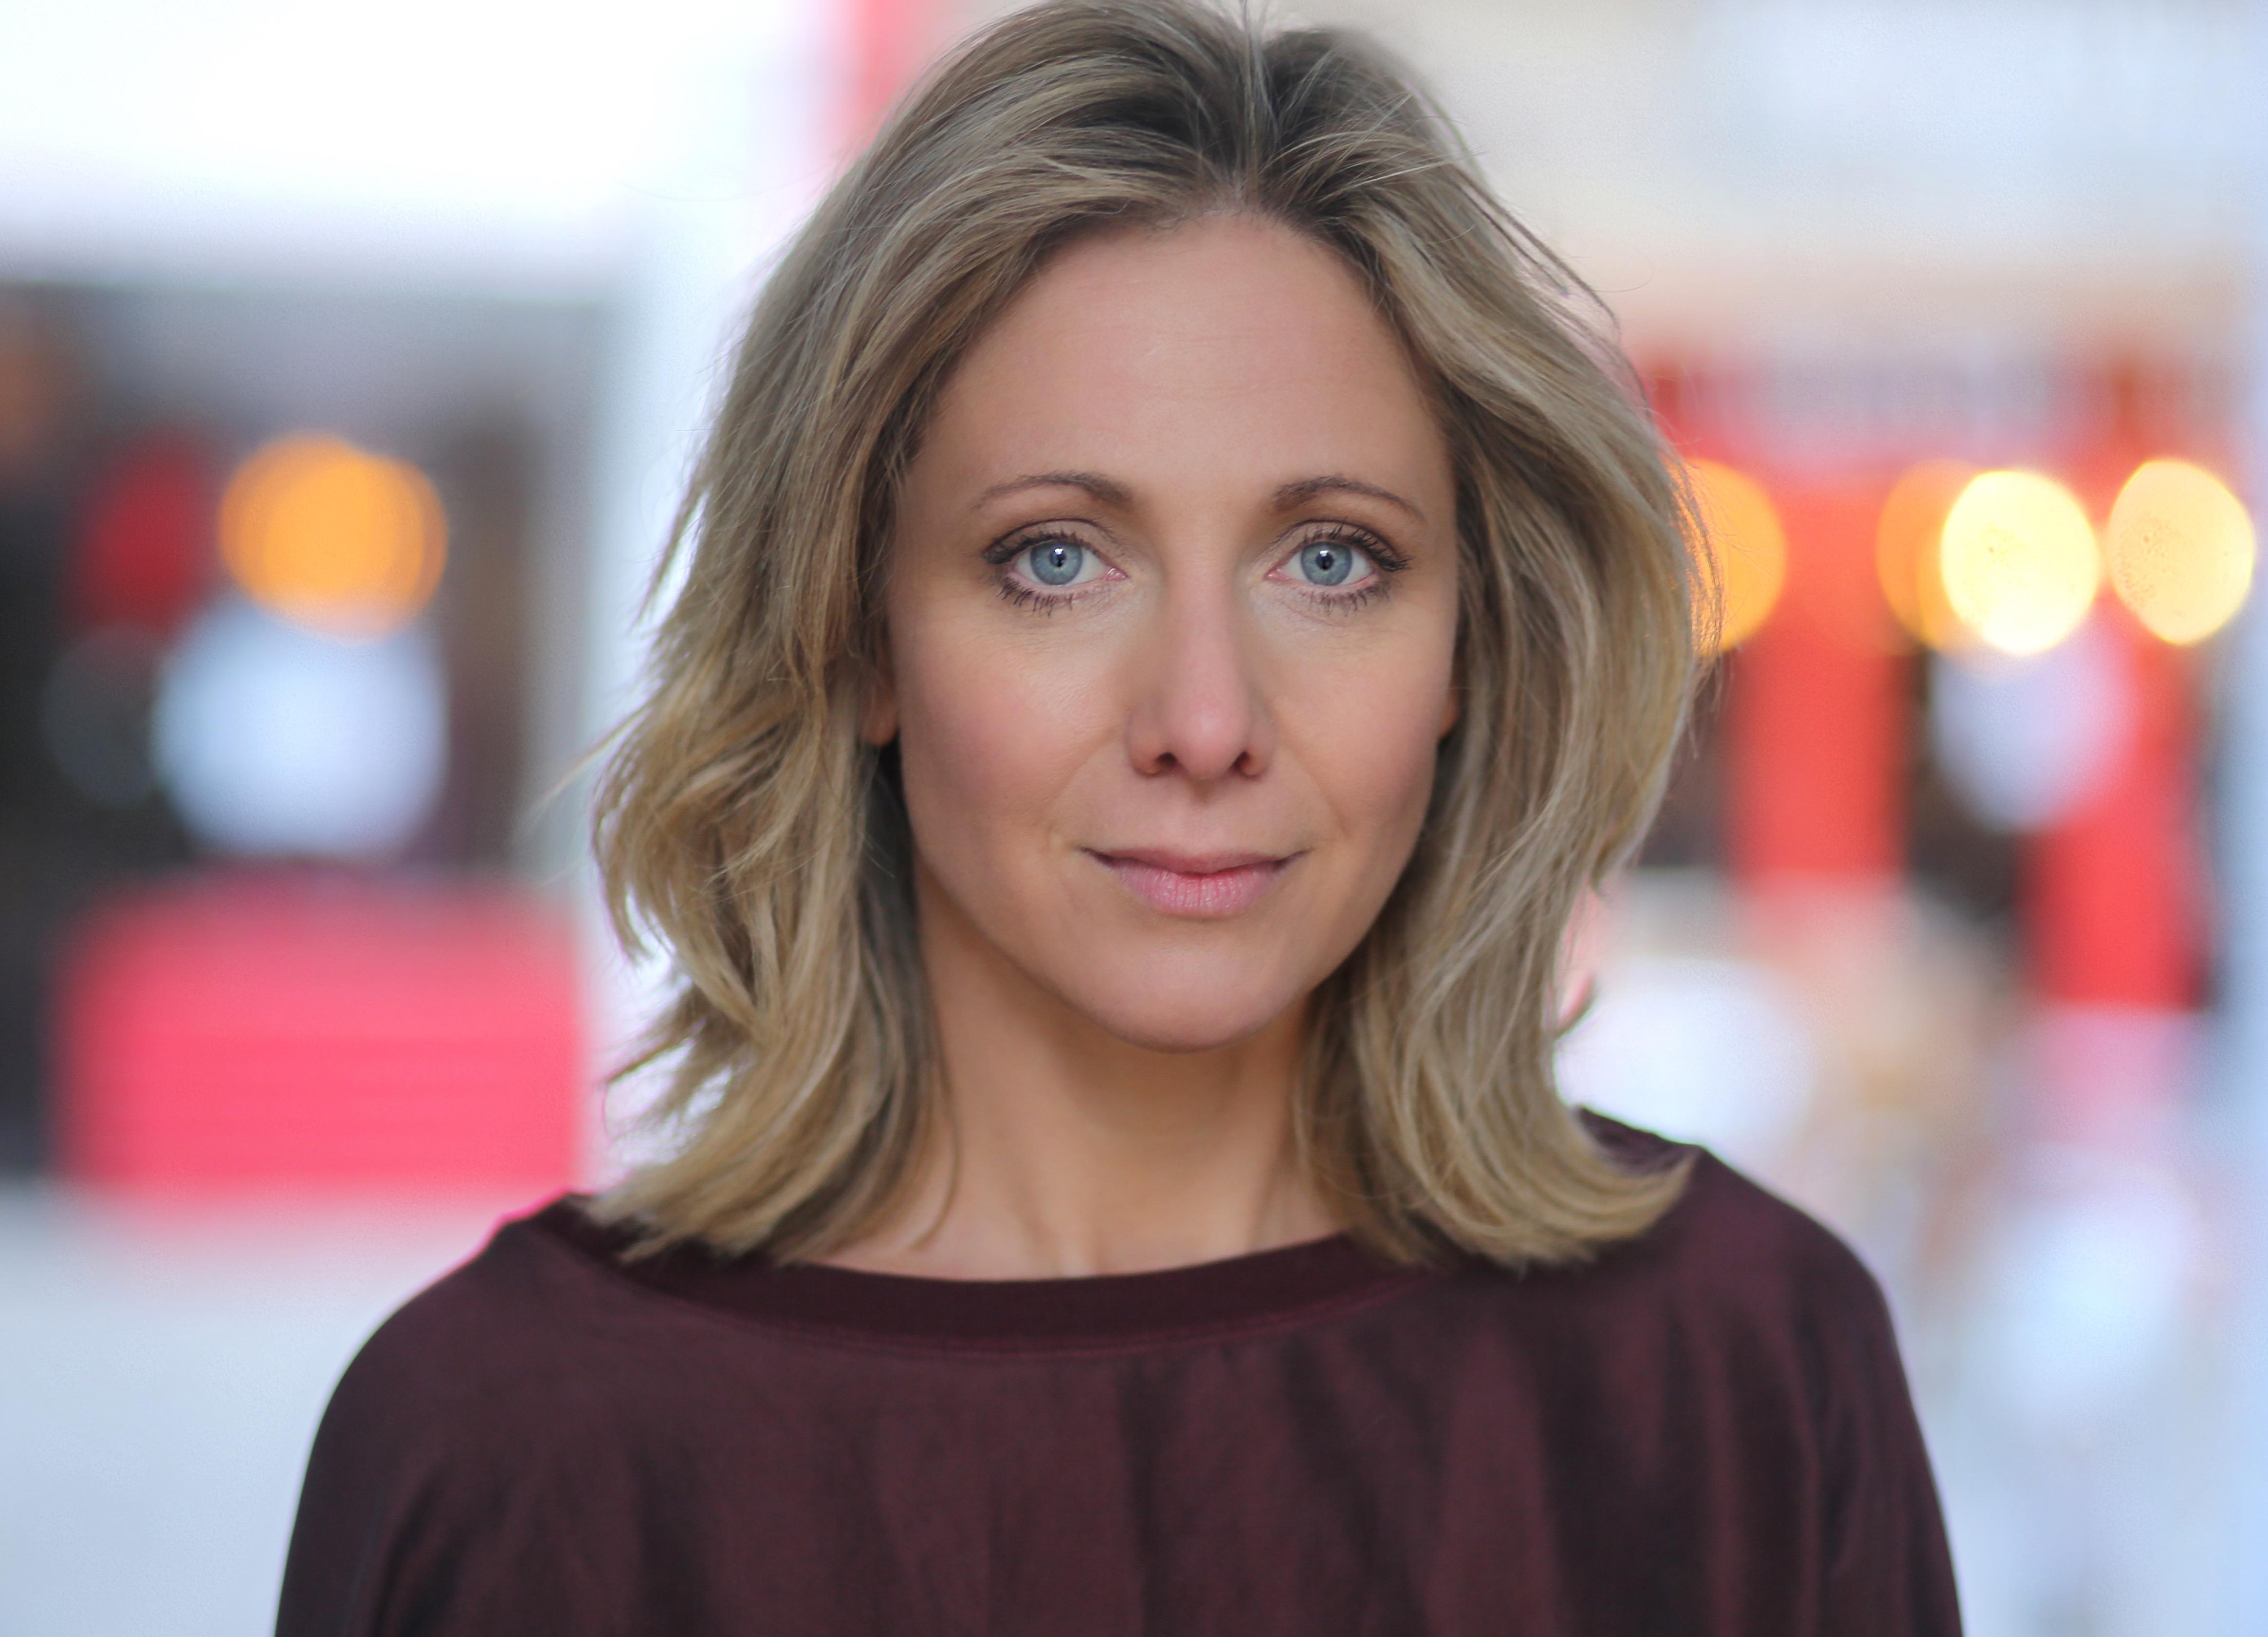 Kerrie Taylor (born 1973)